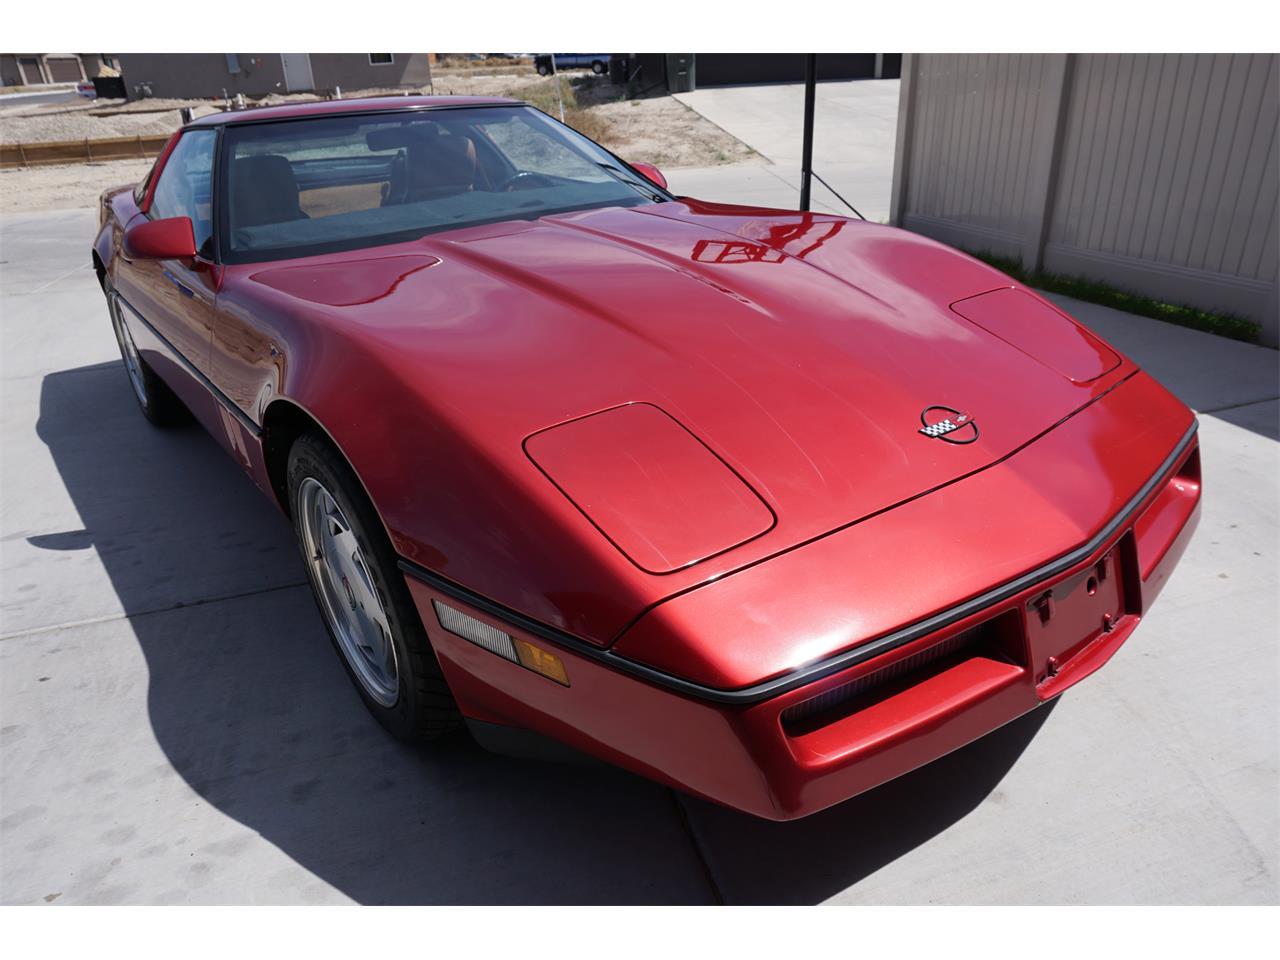 Large Picture of 1989 Chevrolet Corvette C4 located in Grand Junction Colorado - QTU6